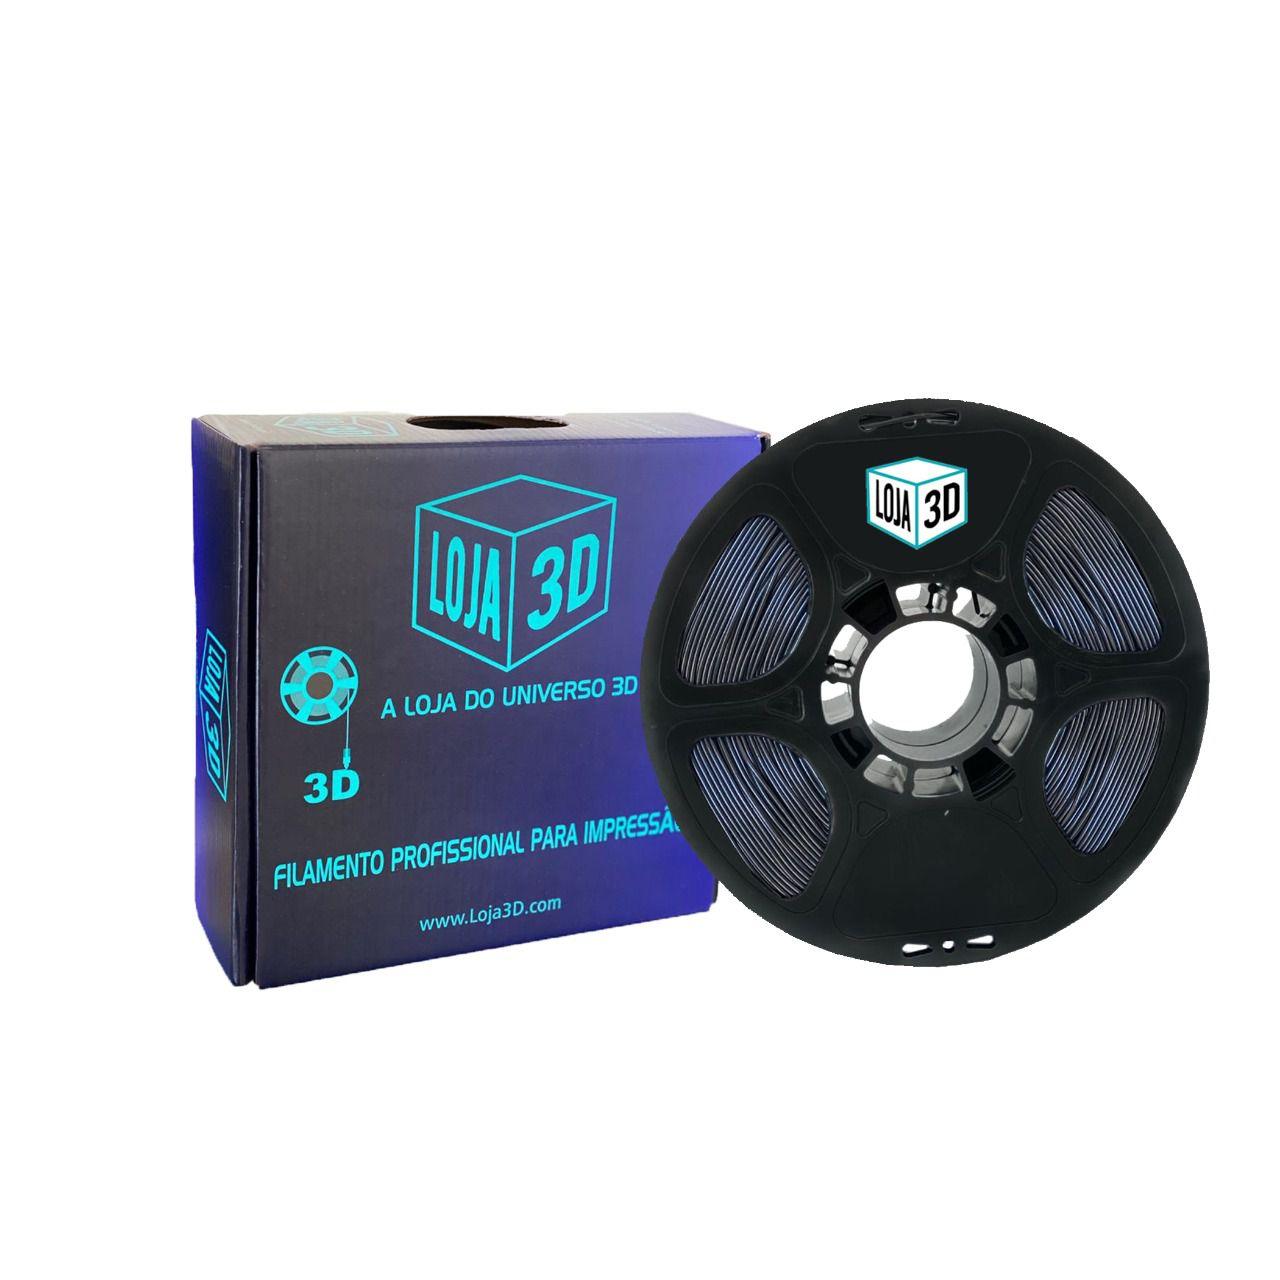 Filamento Flex TPU Premium - Roxo - Loja 3D - 1.75mm - 1kg